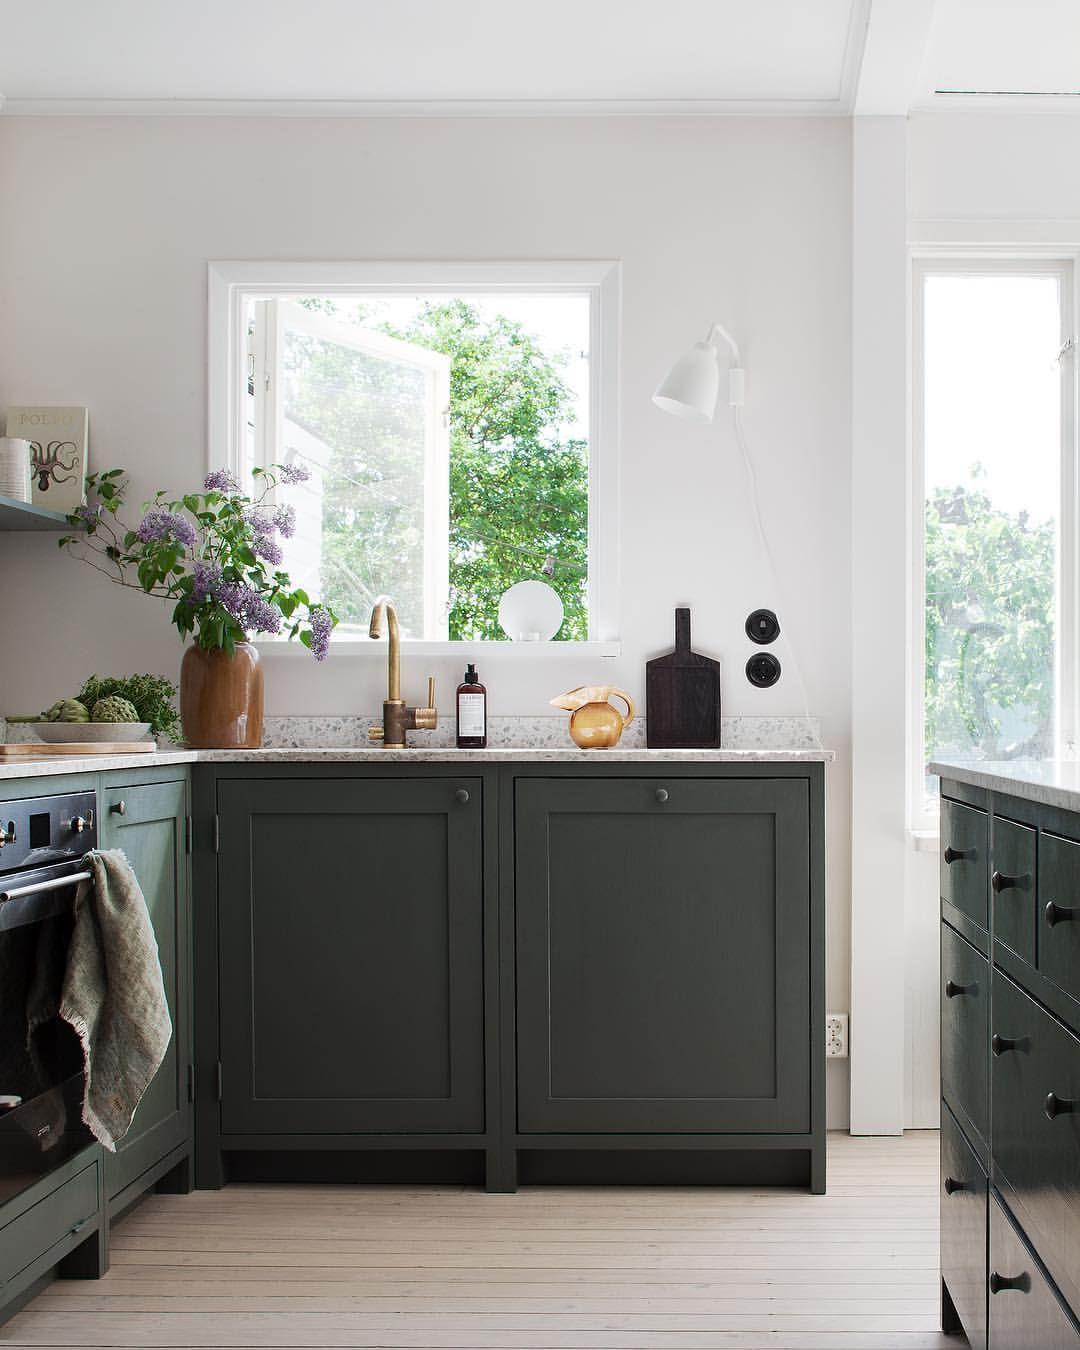 Dark green kitchen cabinets k i t c h e n in pinterest